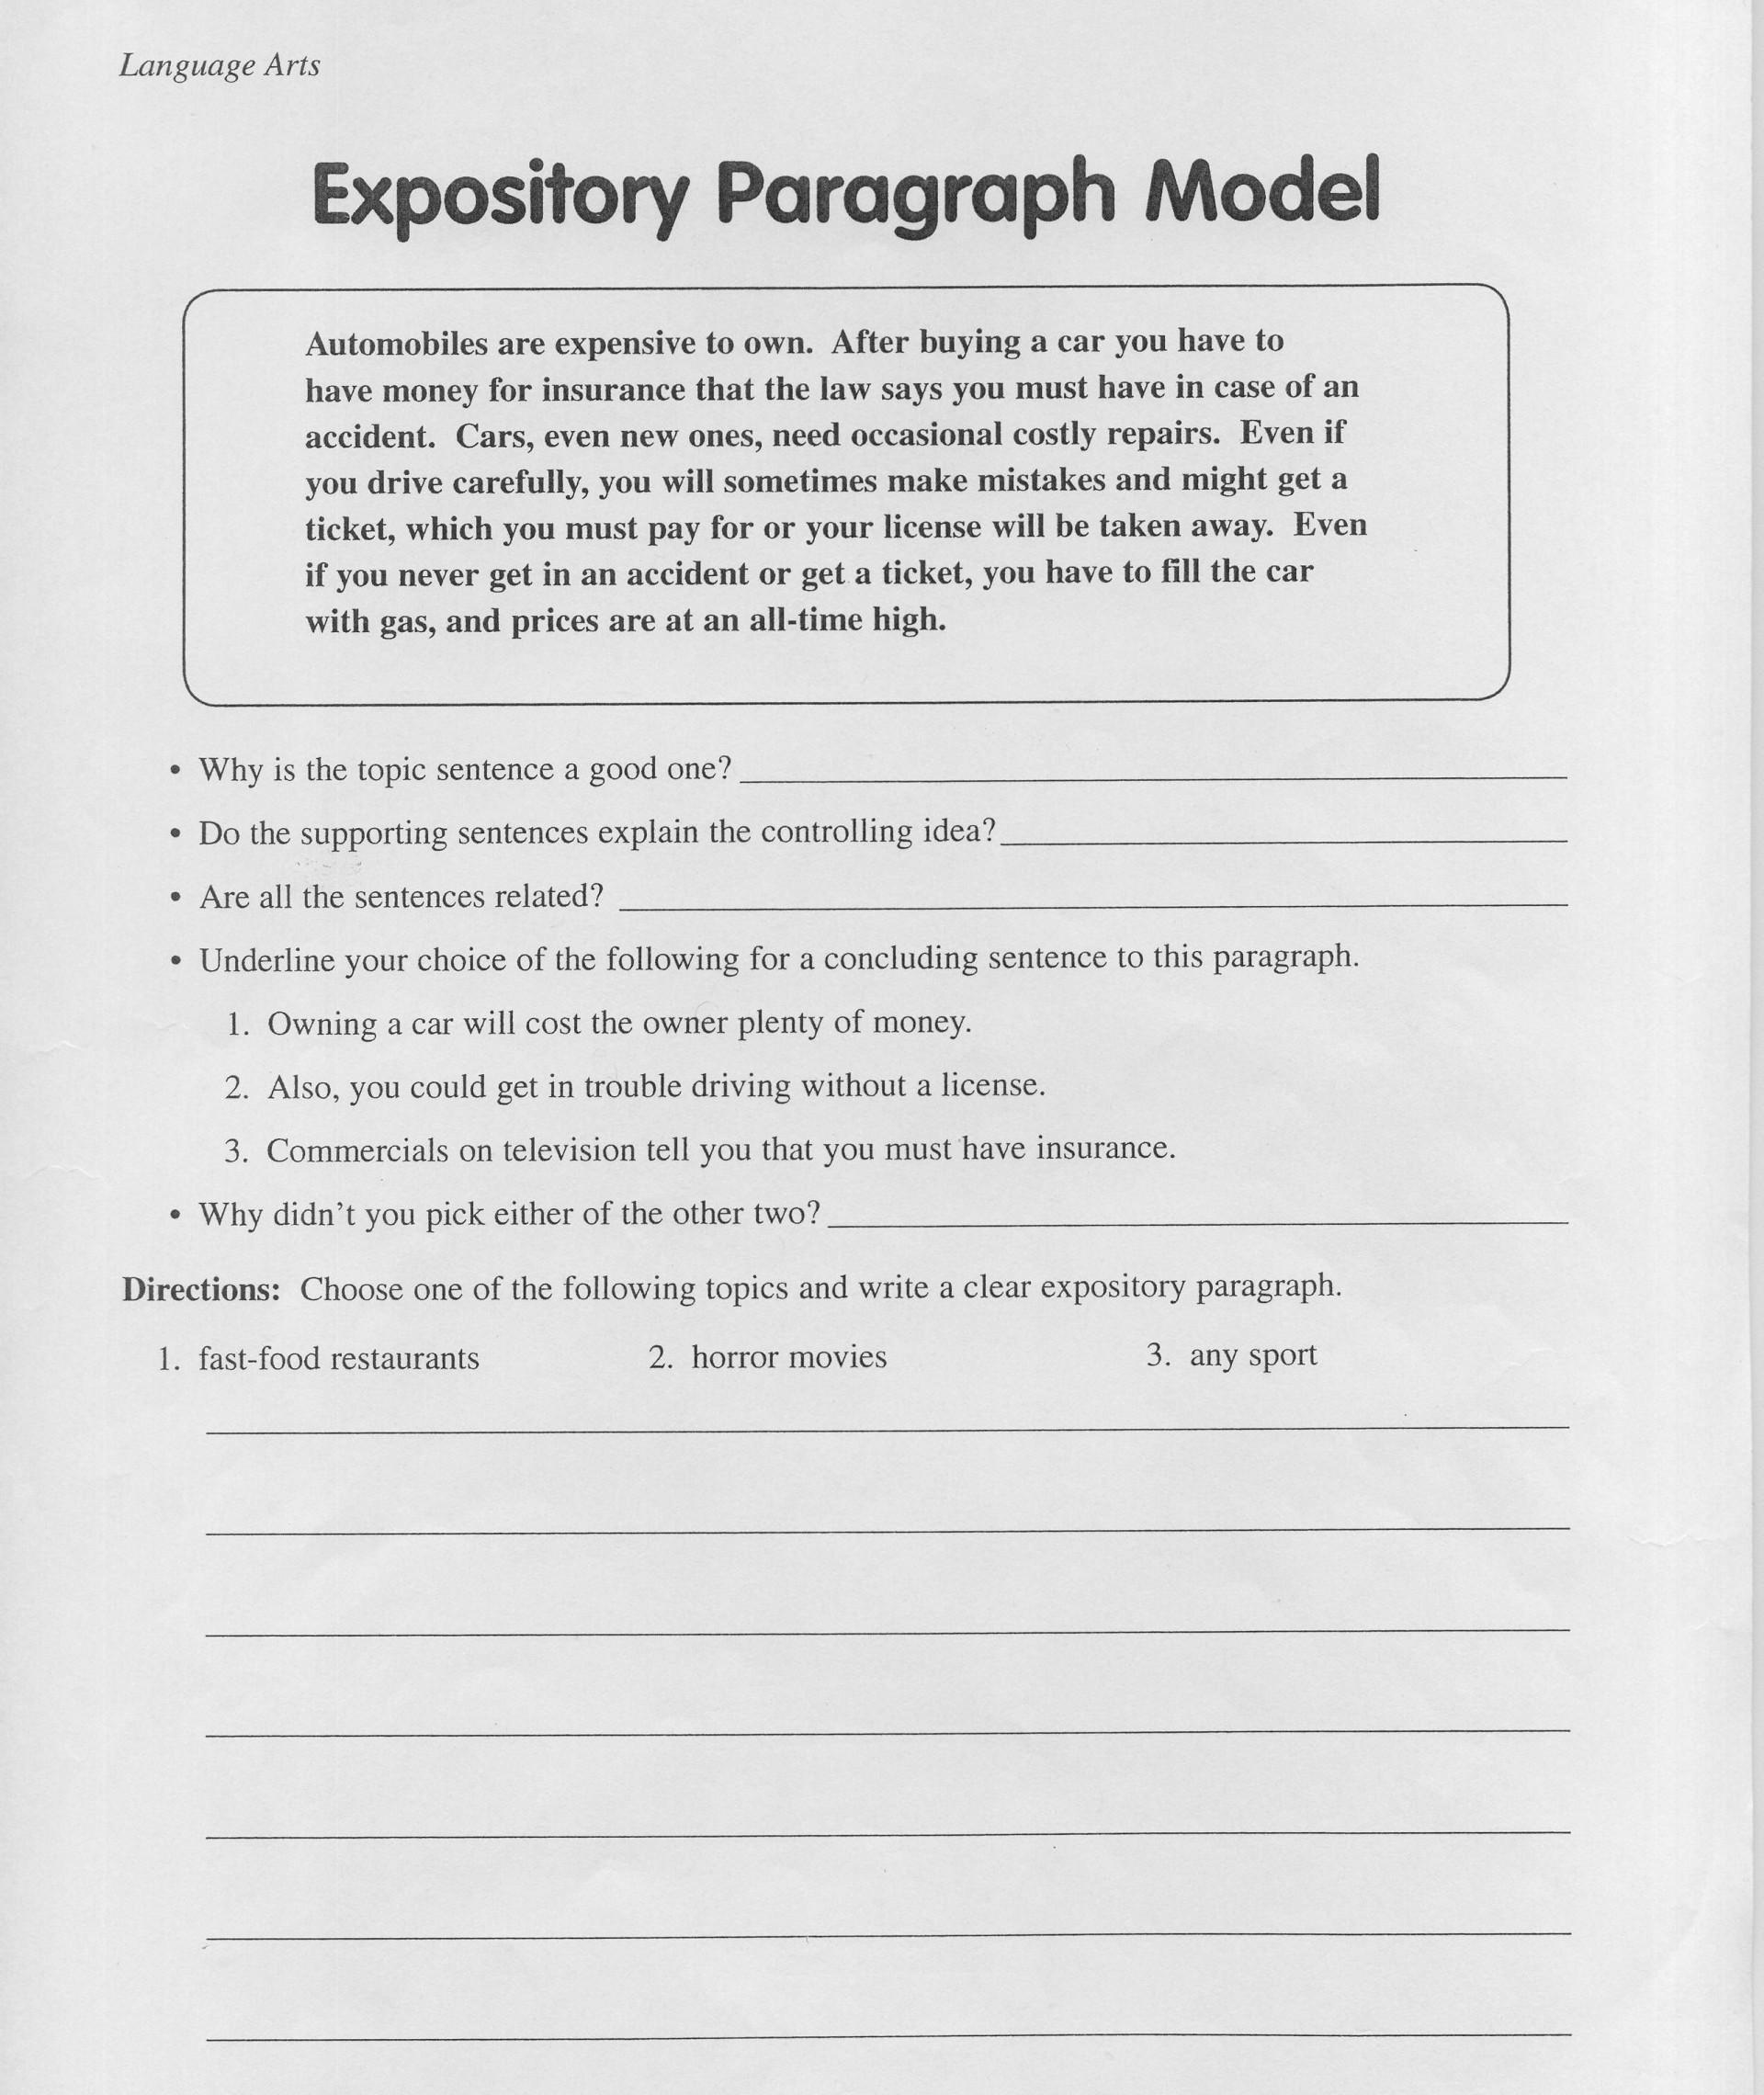 022 Essay Example 6th Grade Surprising Topics Reflective Narrative Writing Prompts Science 1920